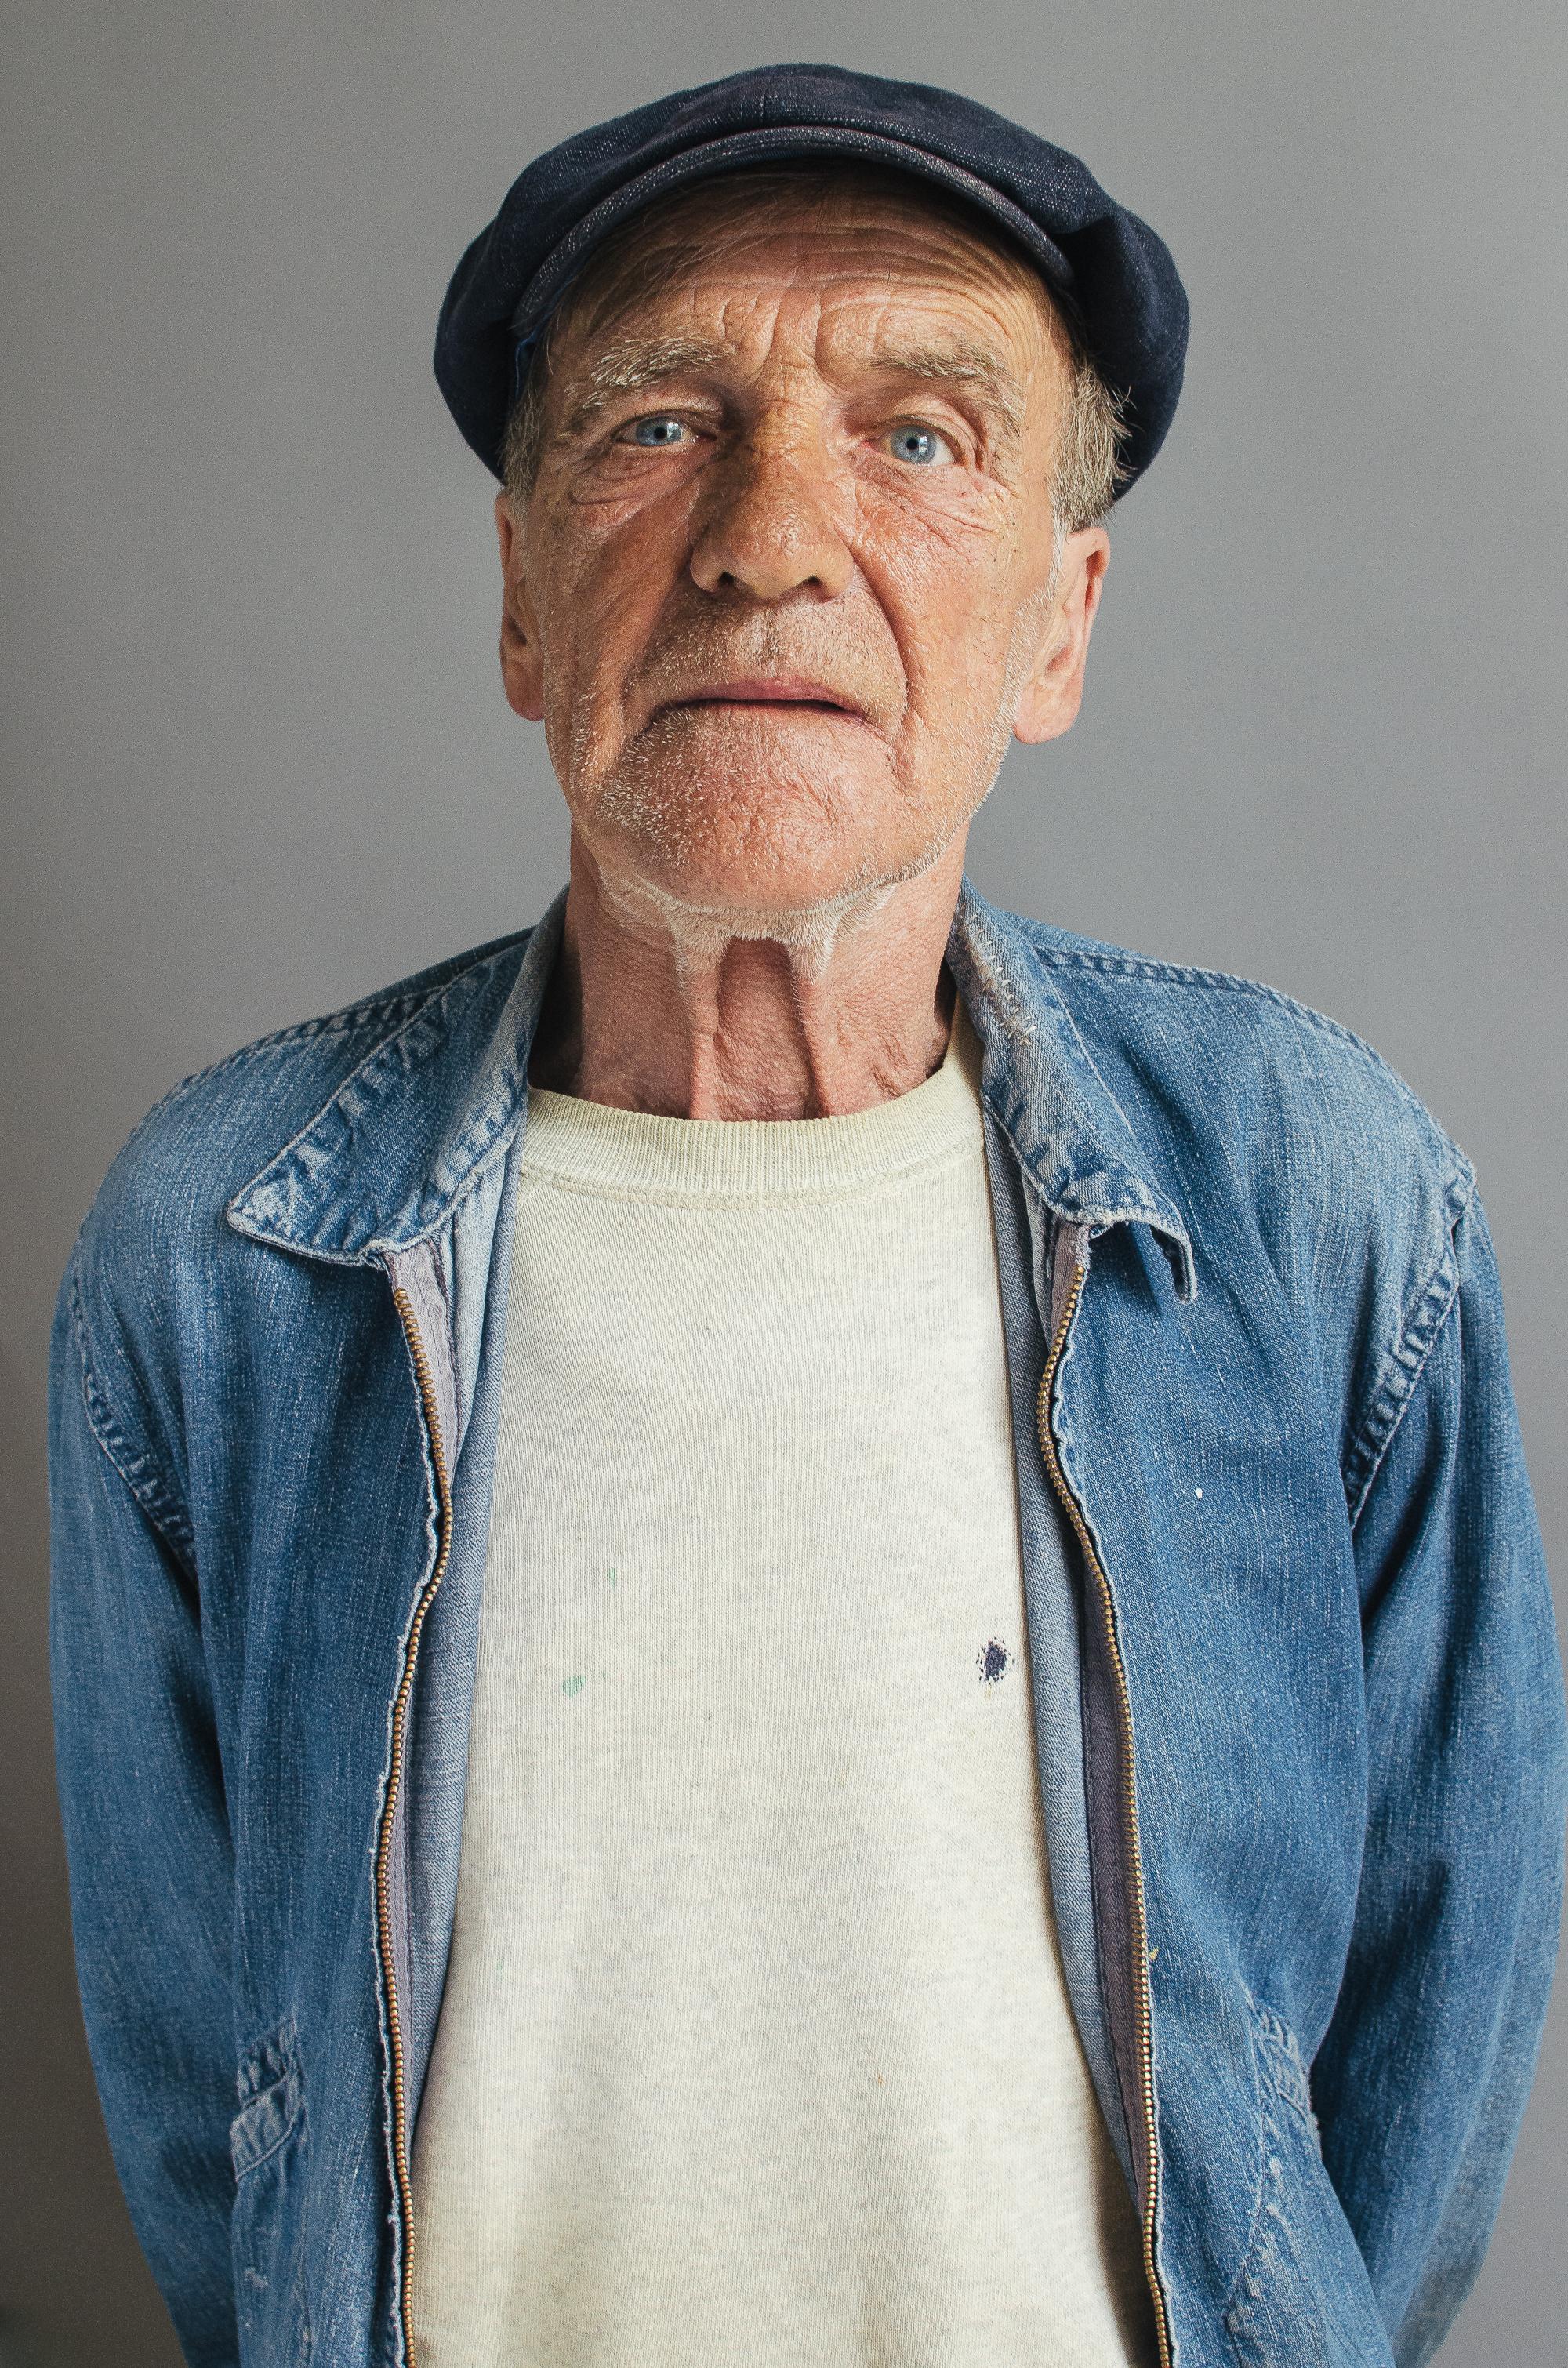 Mick-sharp-6.jpg